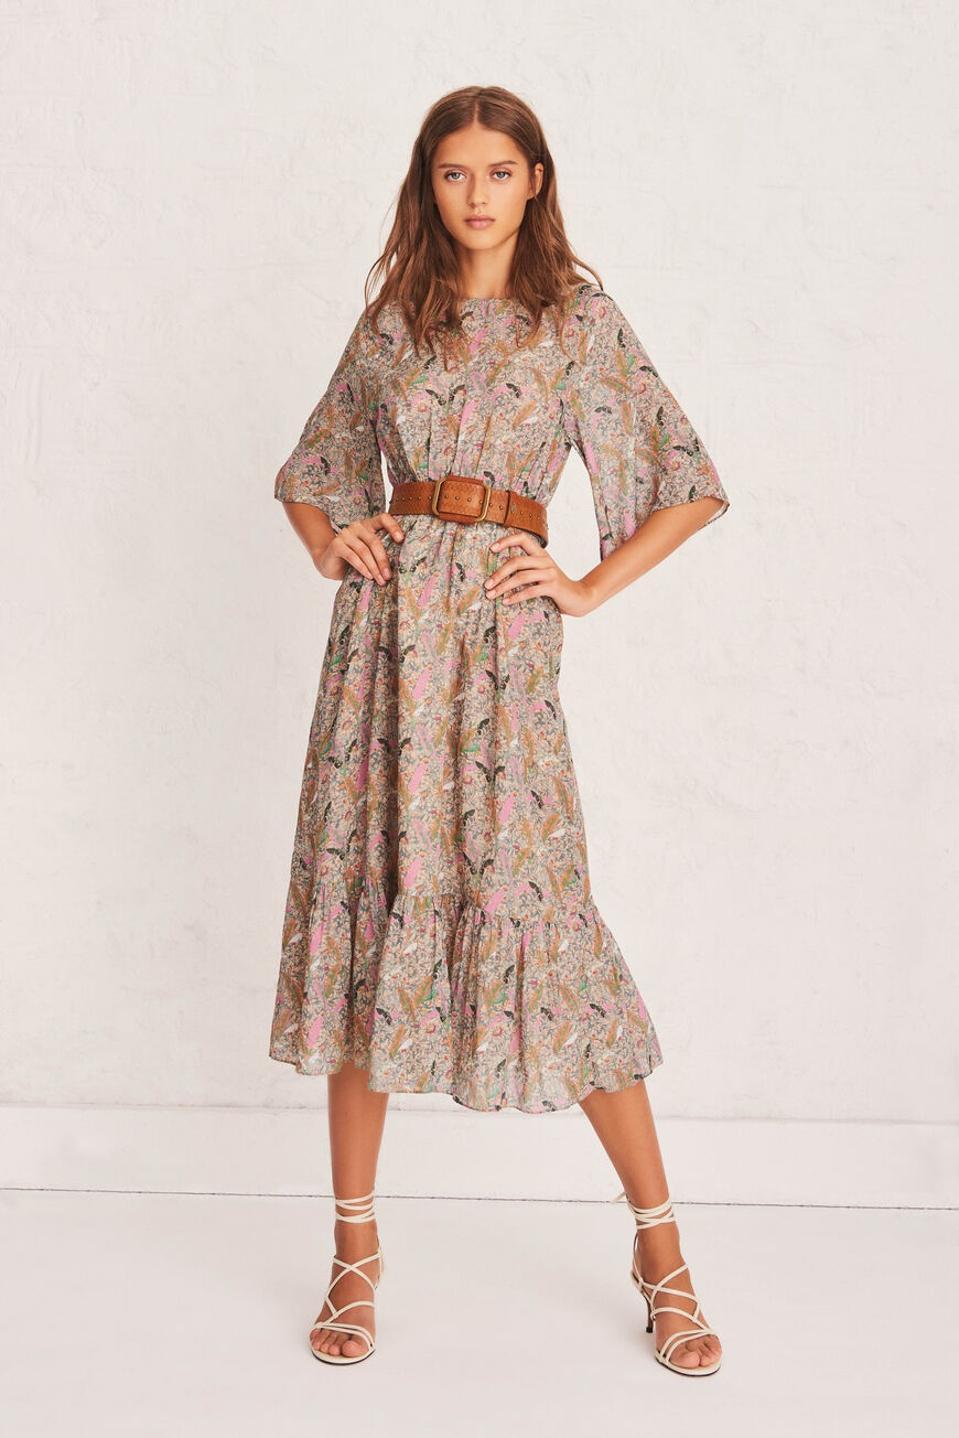 JAMI dress: